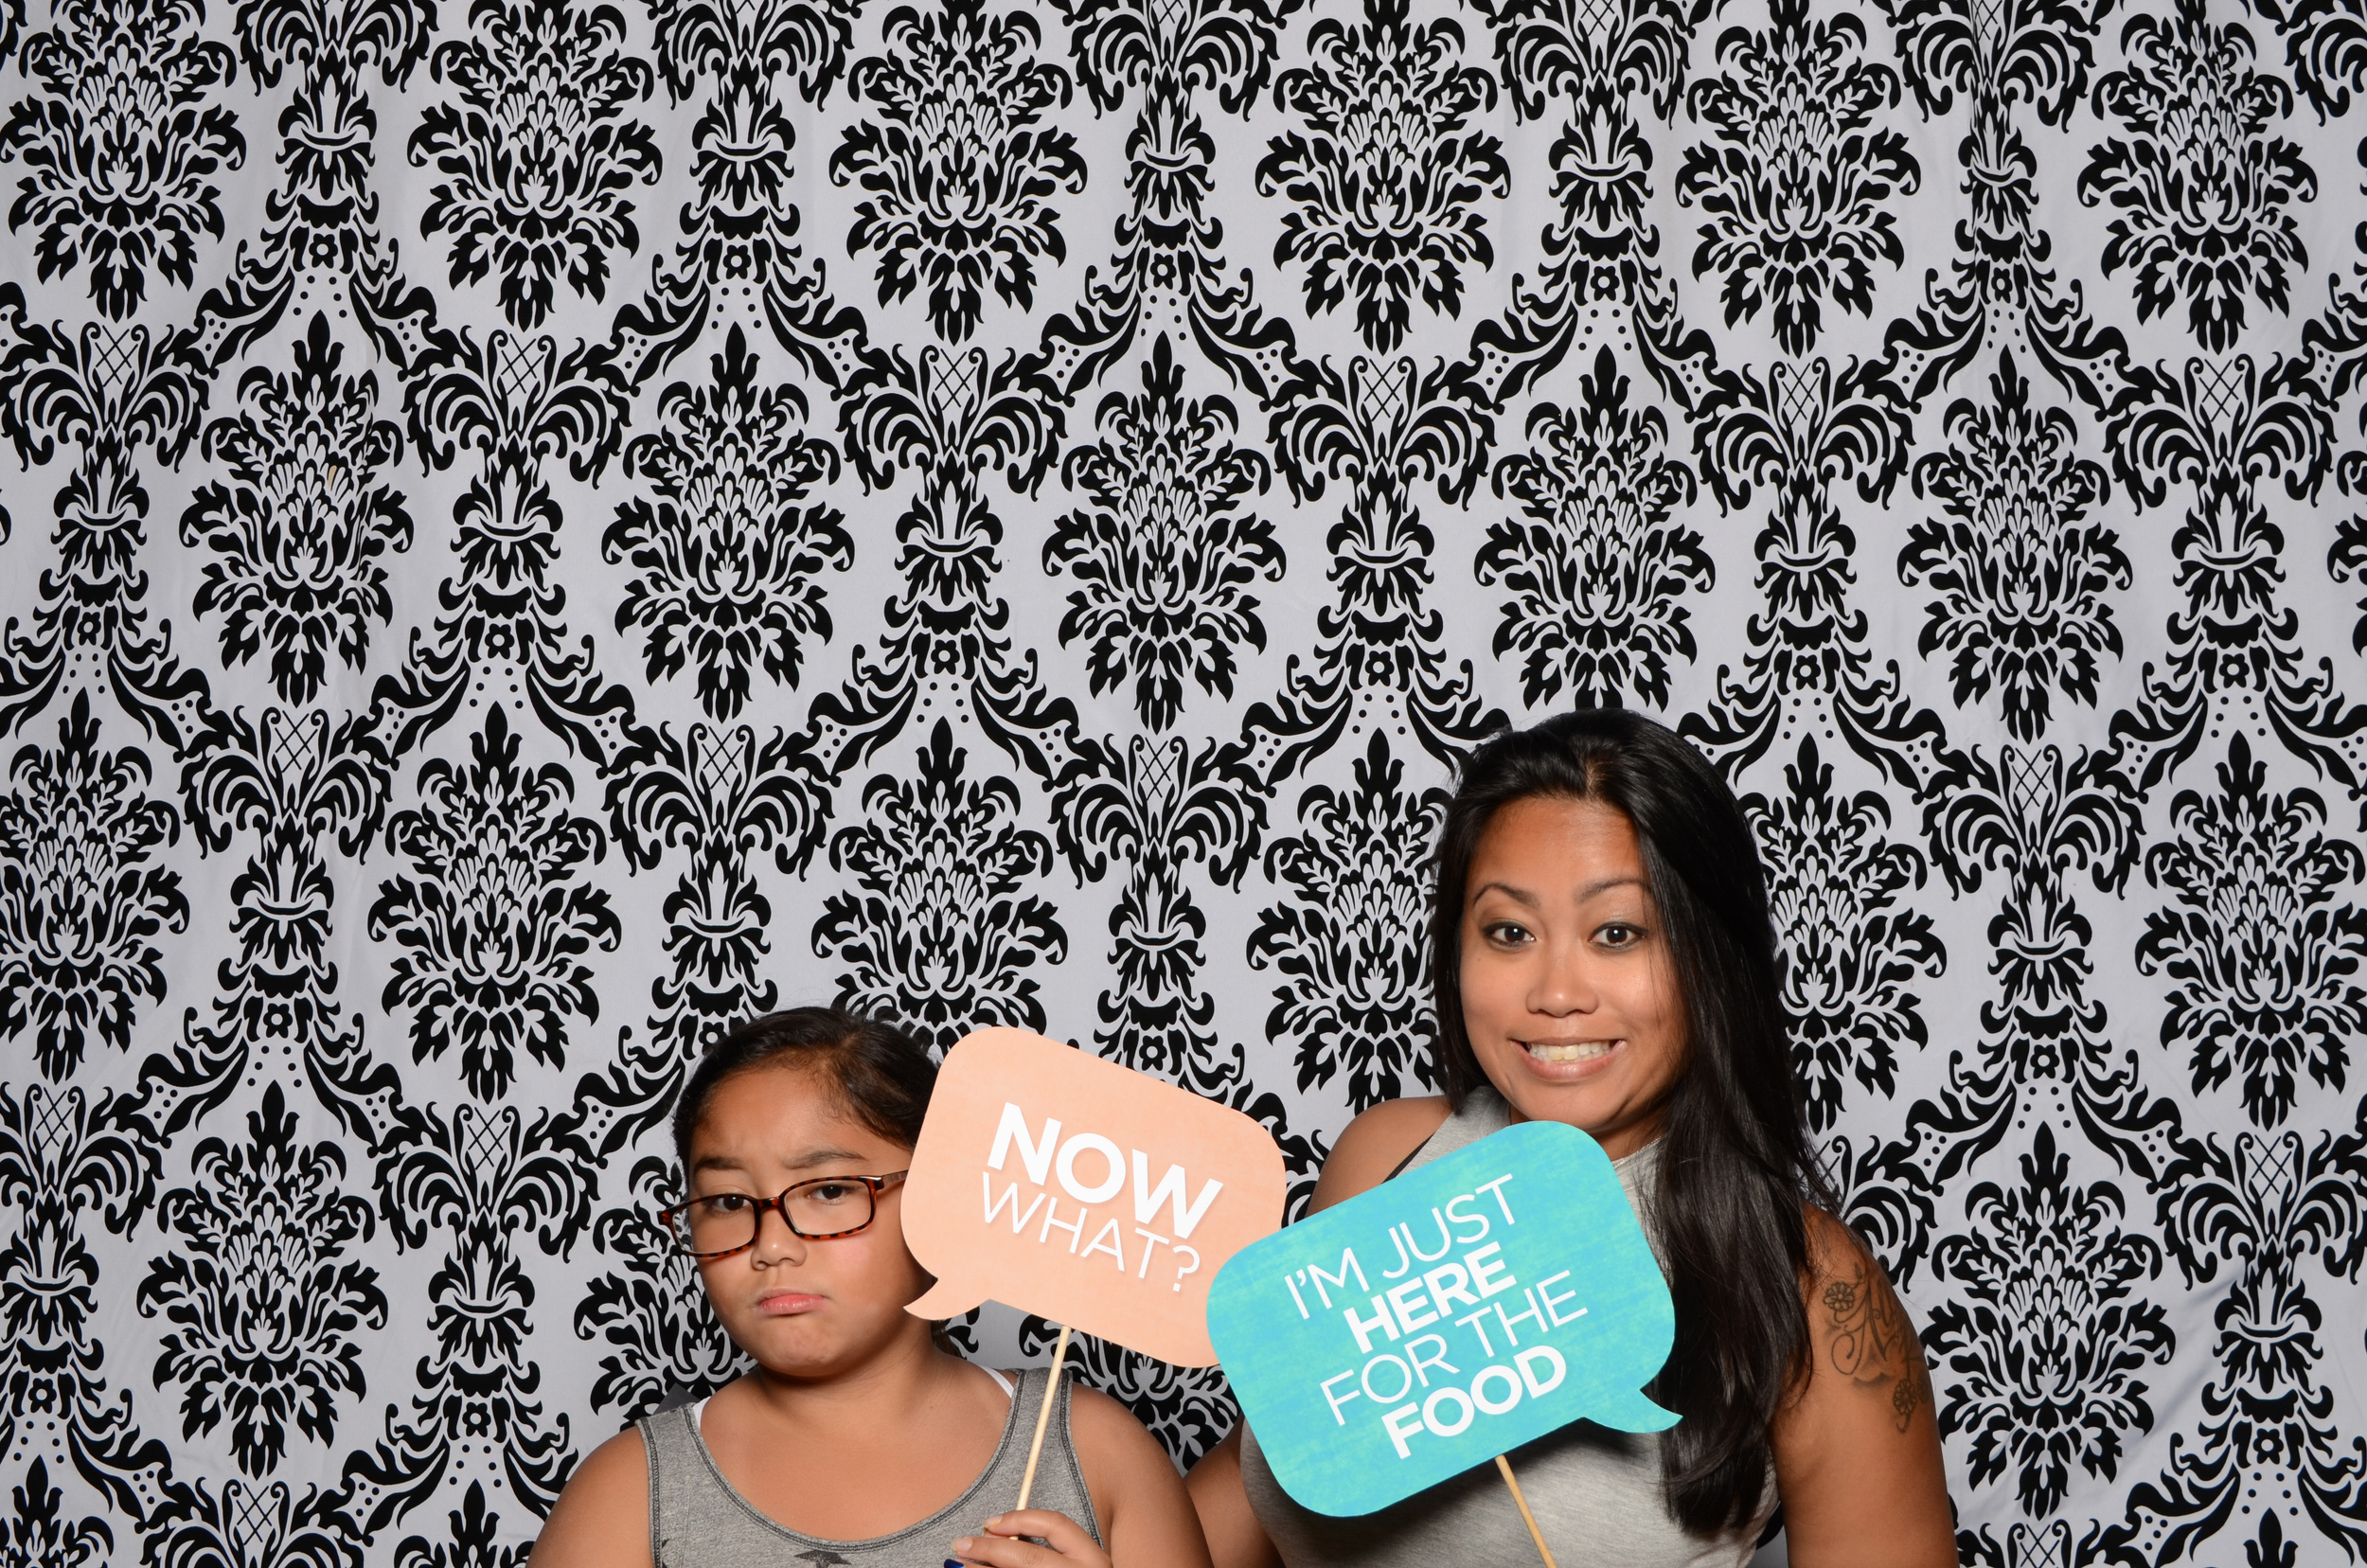 piscataway-graduation-birthday-photobooth-photo-49.jpg